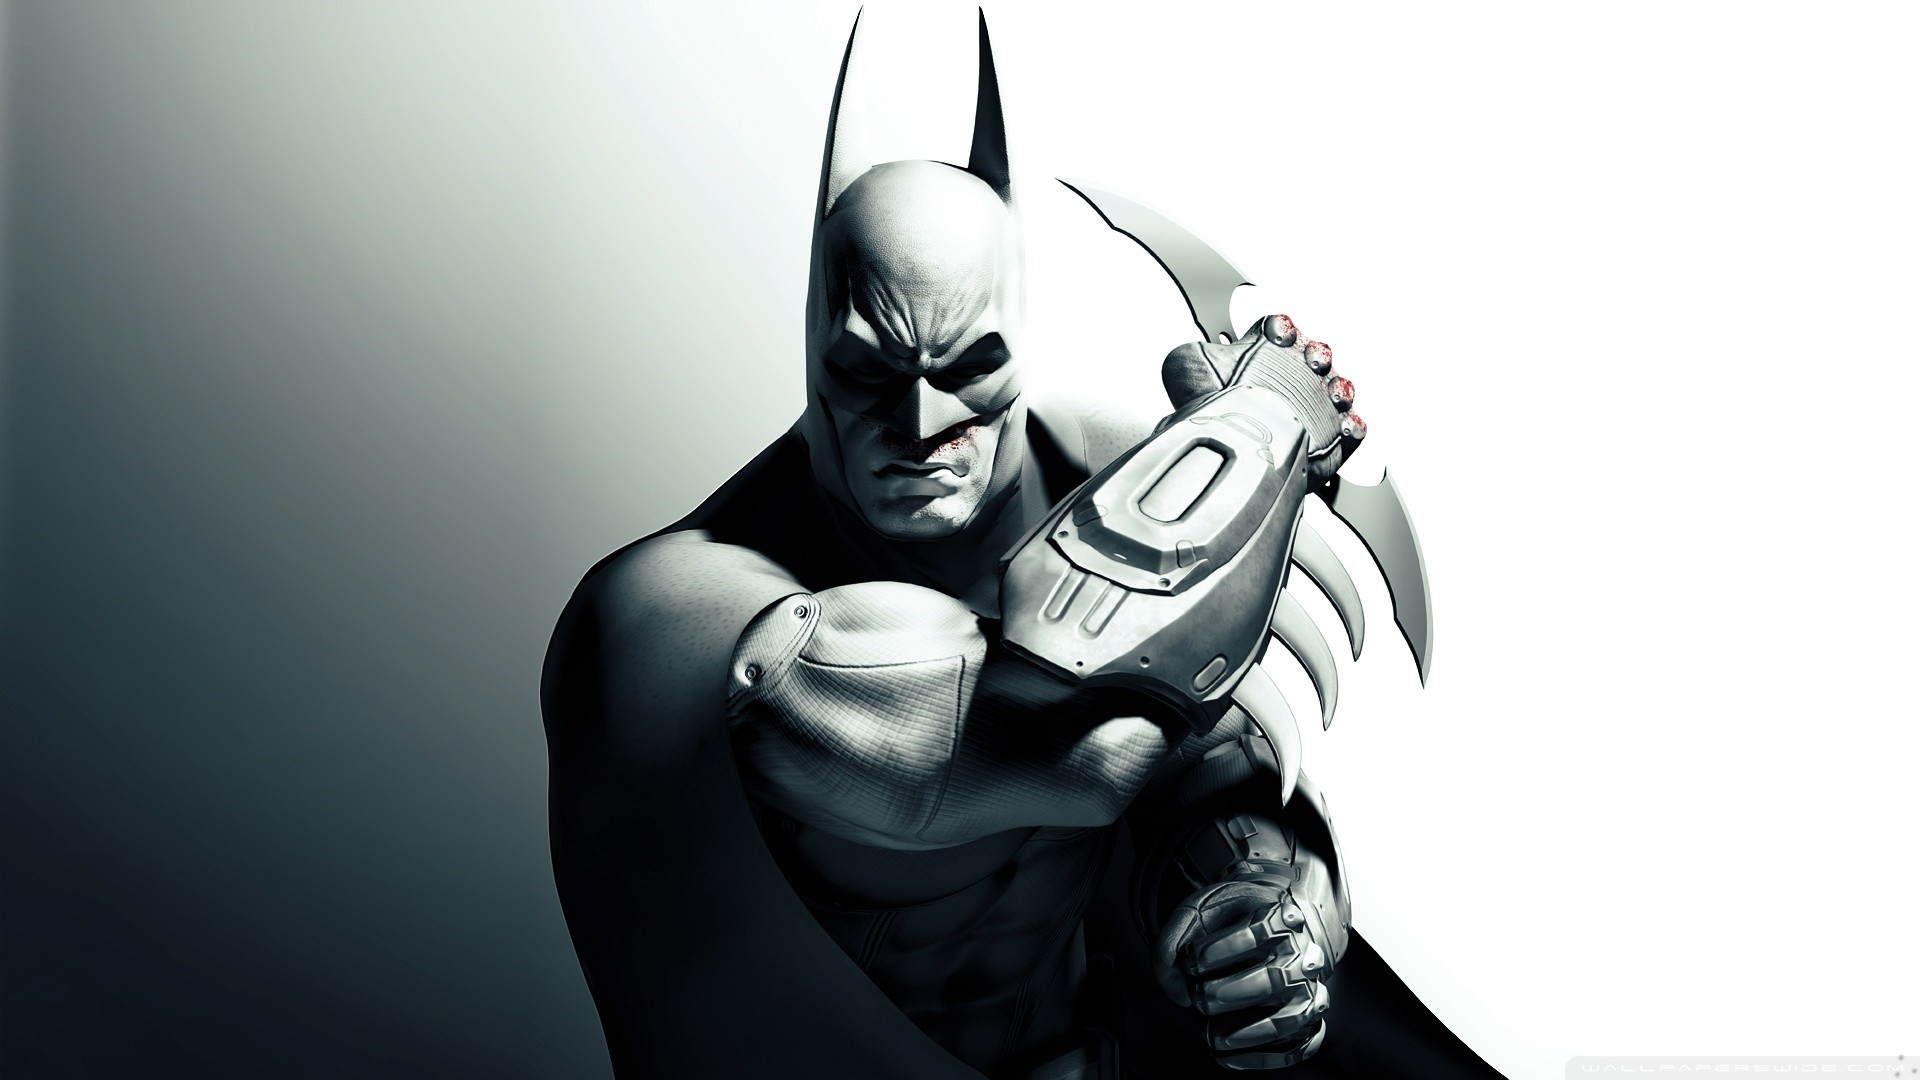 Batman hd wallpapers 1080p 76 images for Joker wallpaper 4k